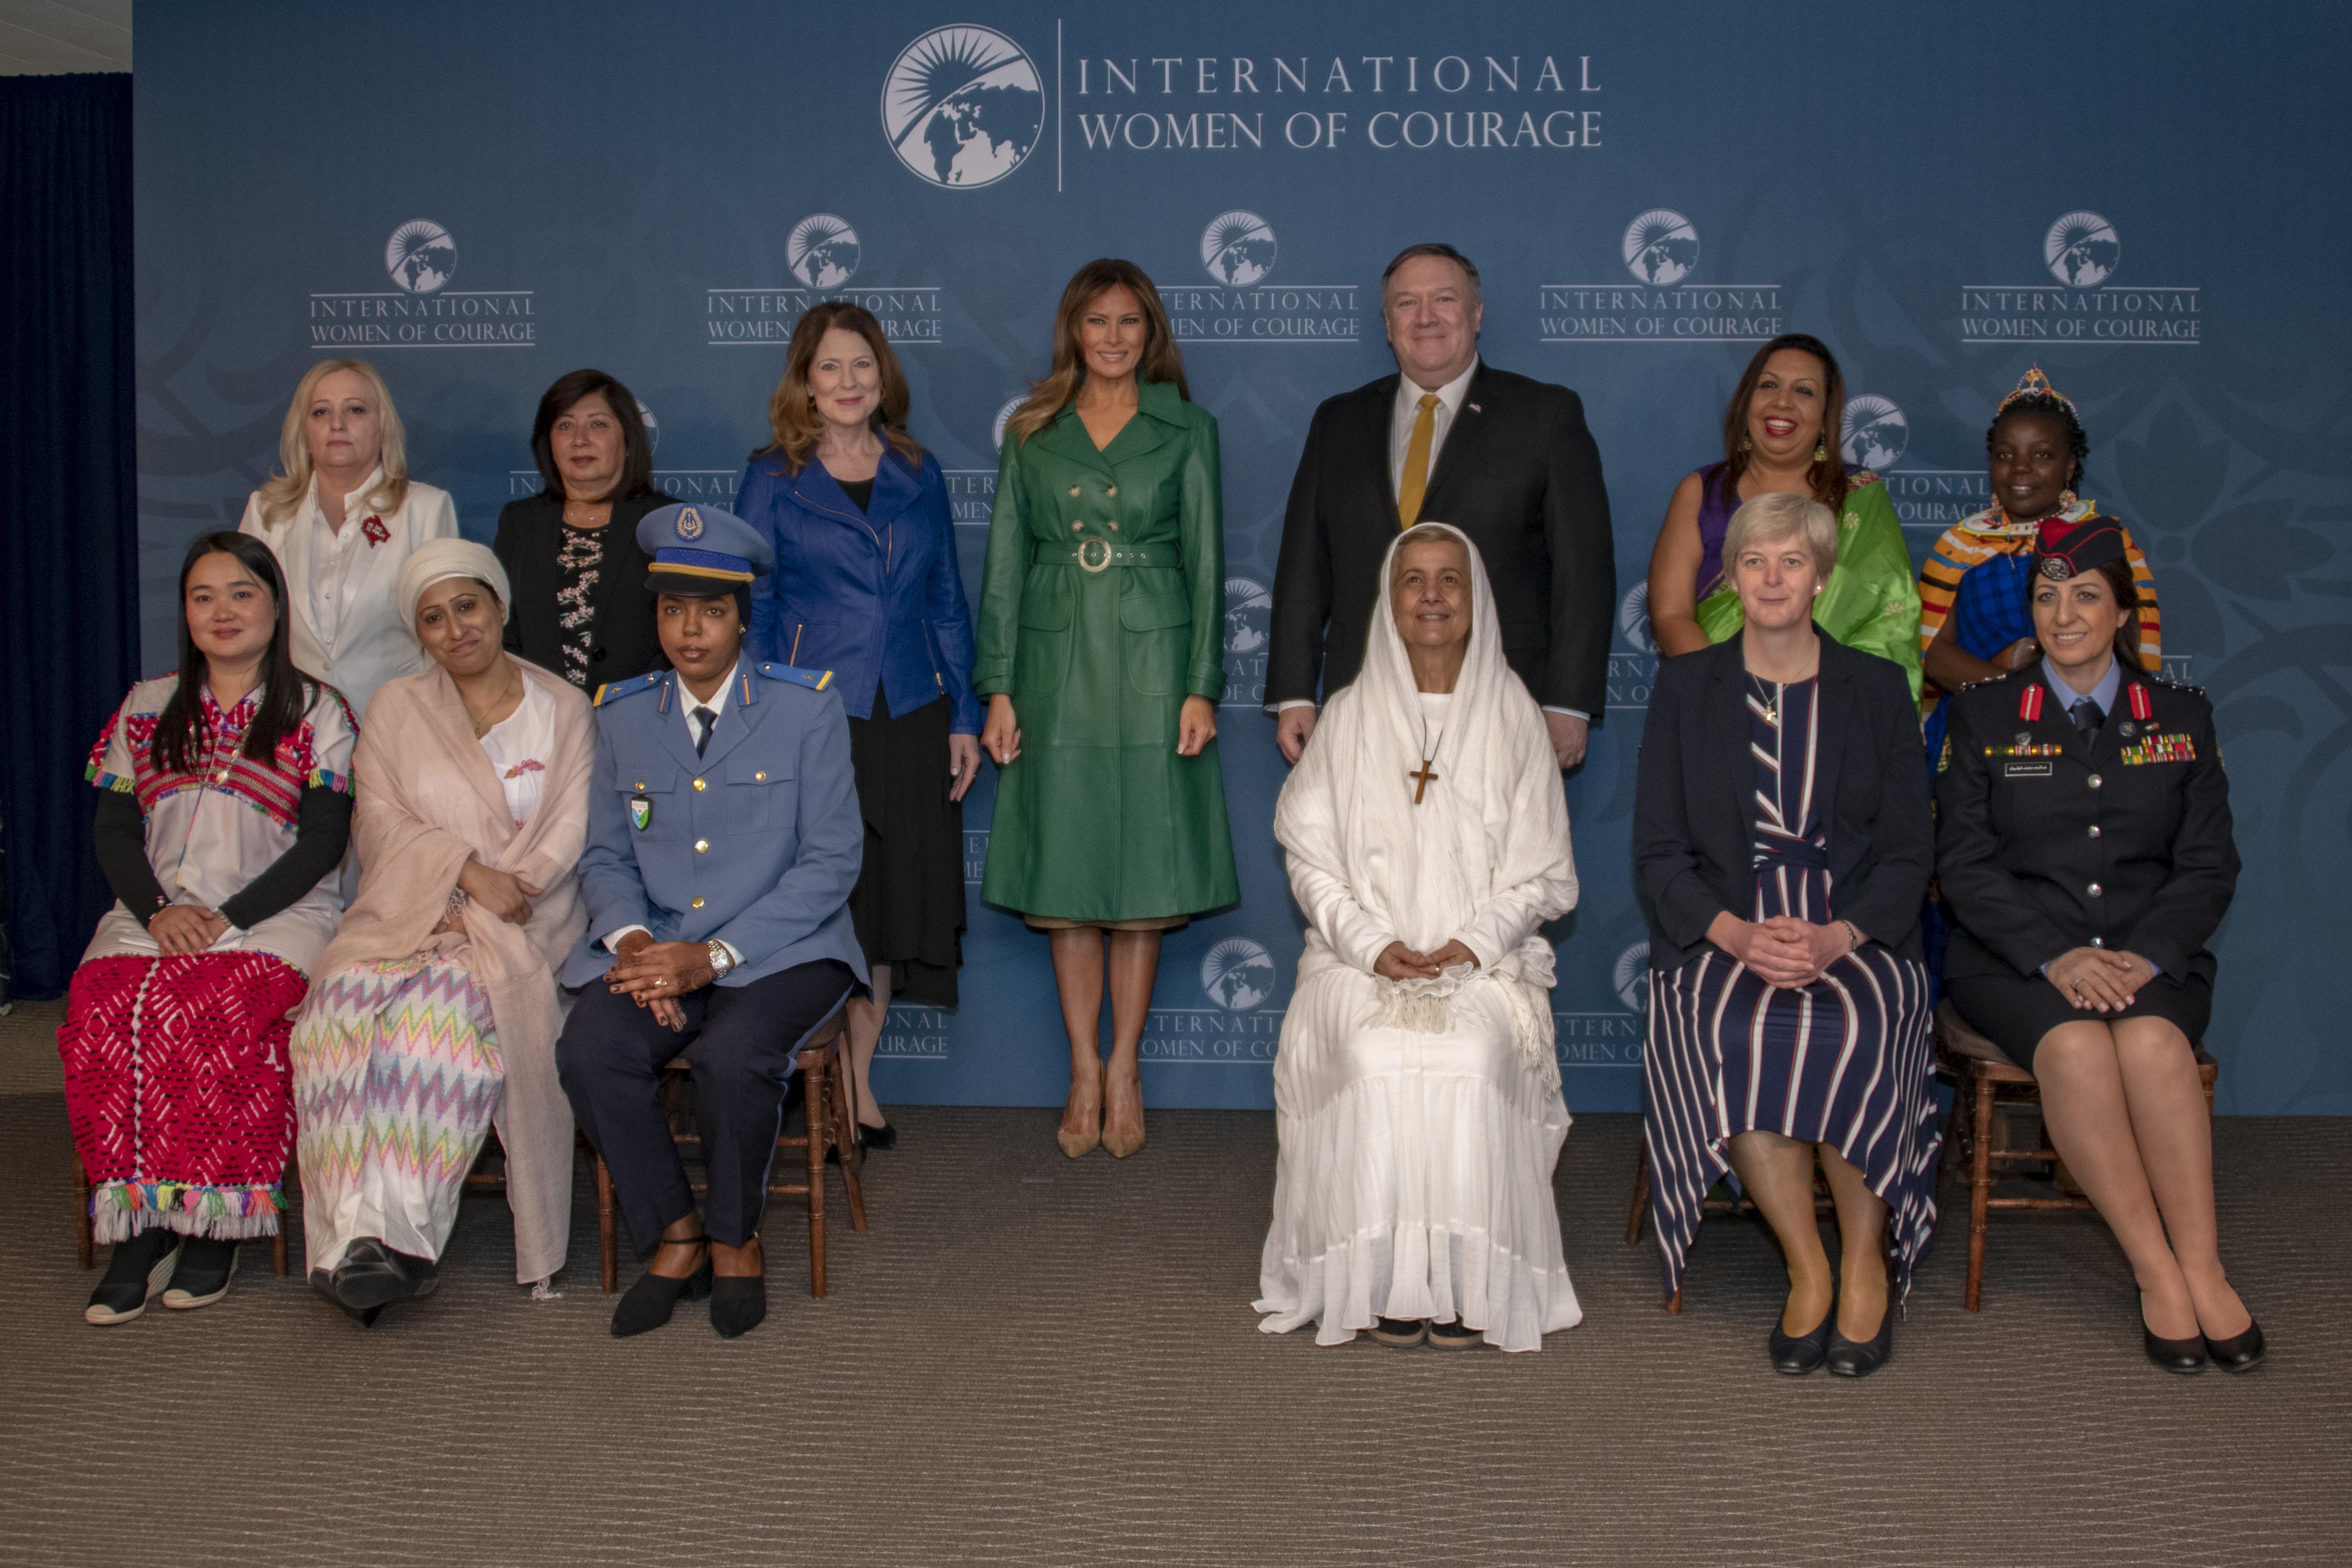 2019 International Women of Courage Awardees